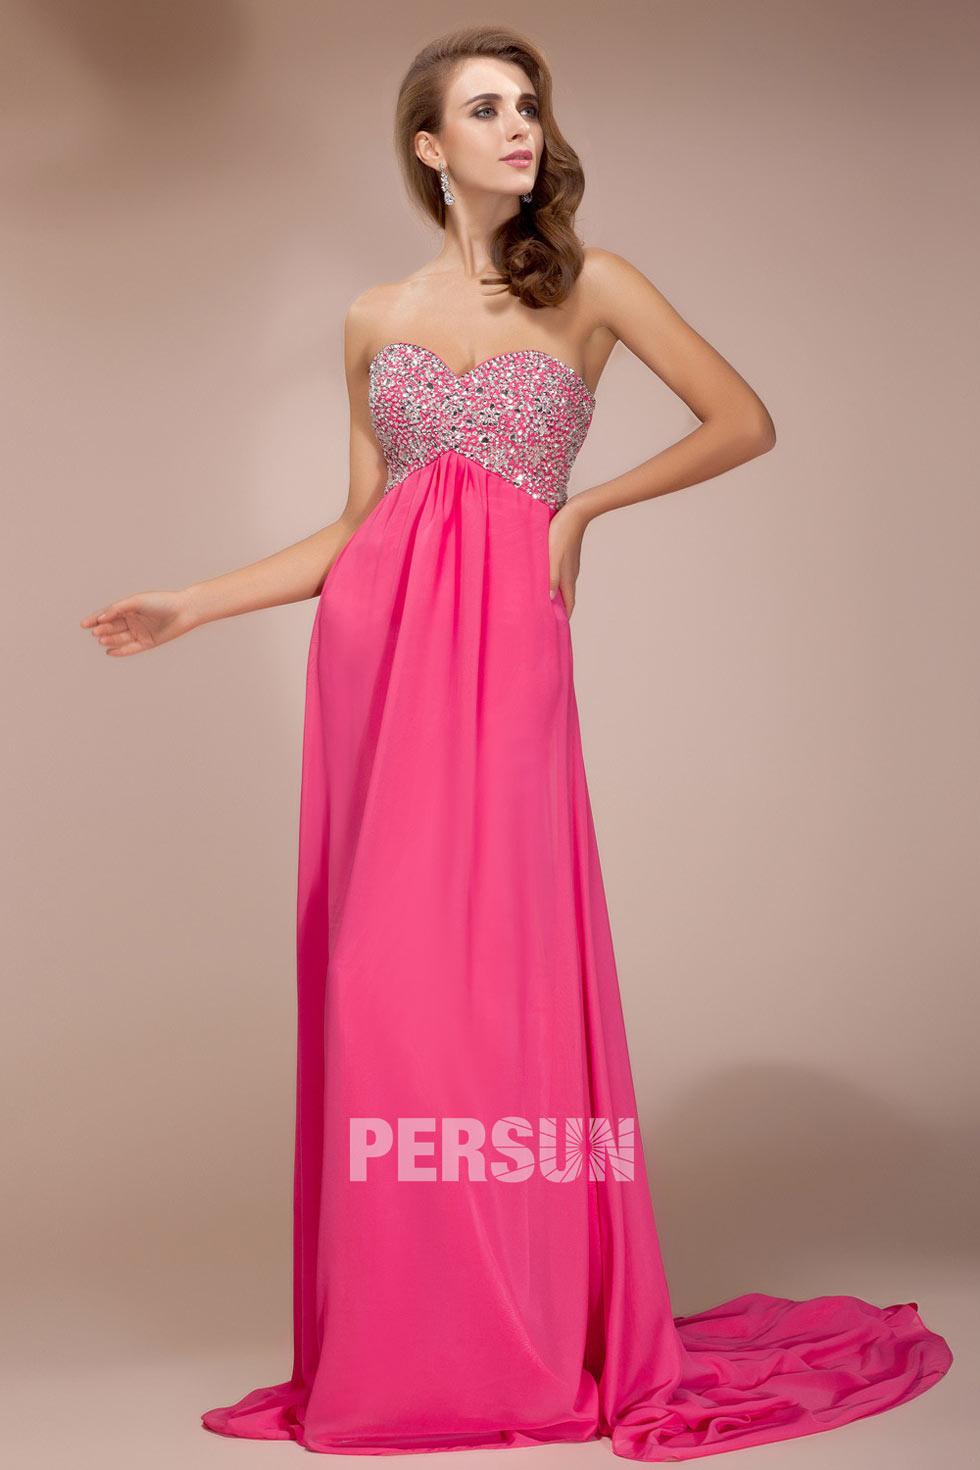 robe empire longue pour soir/e mariage magnifique